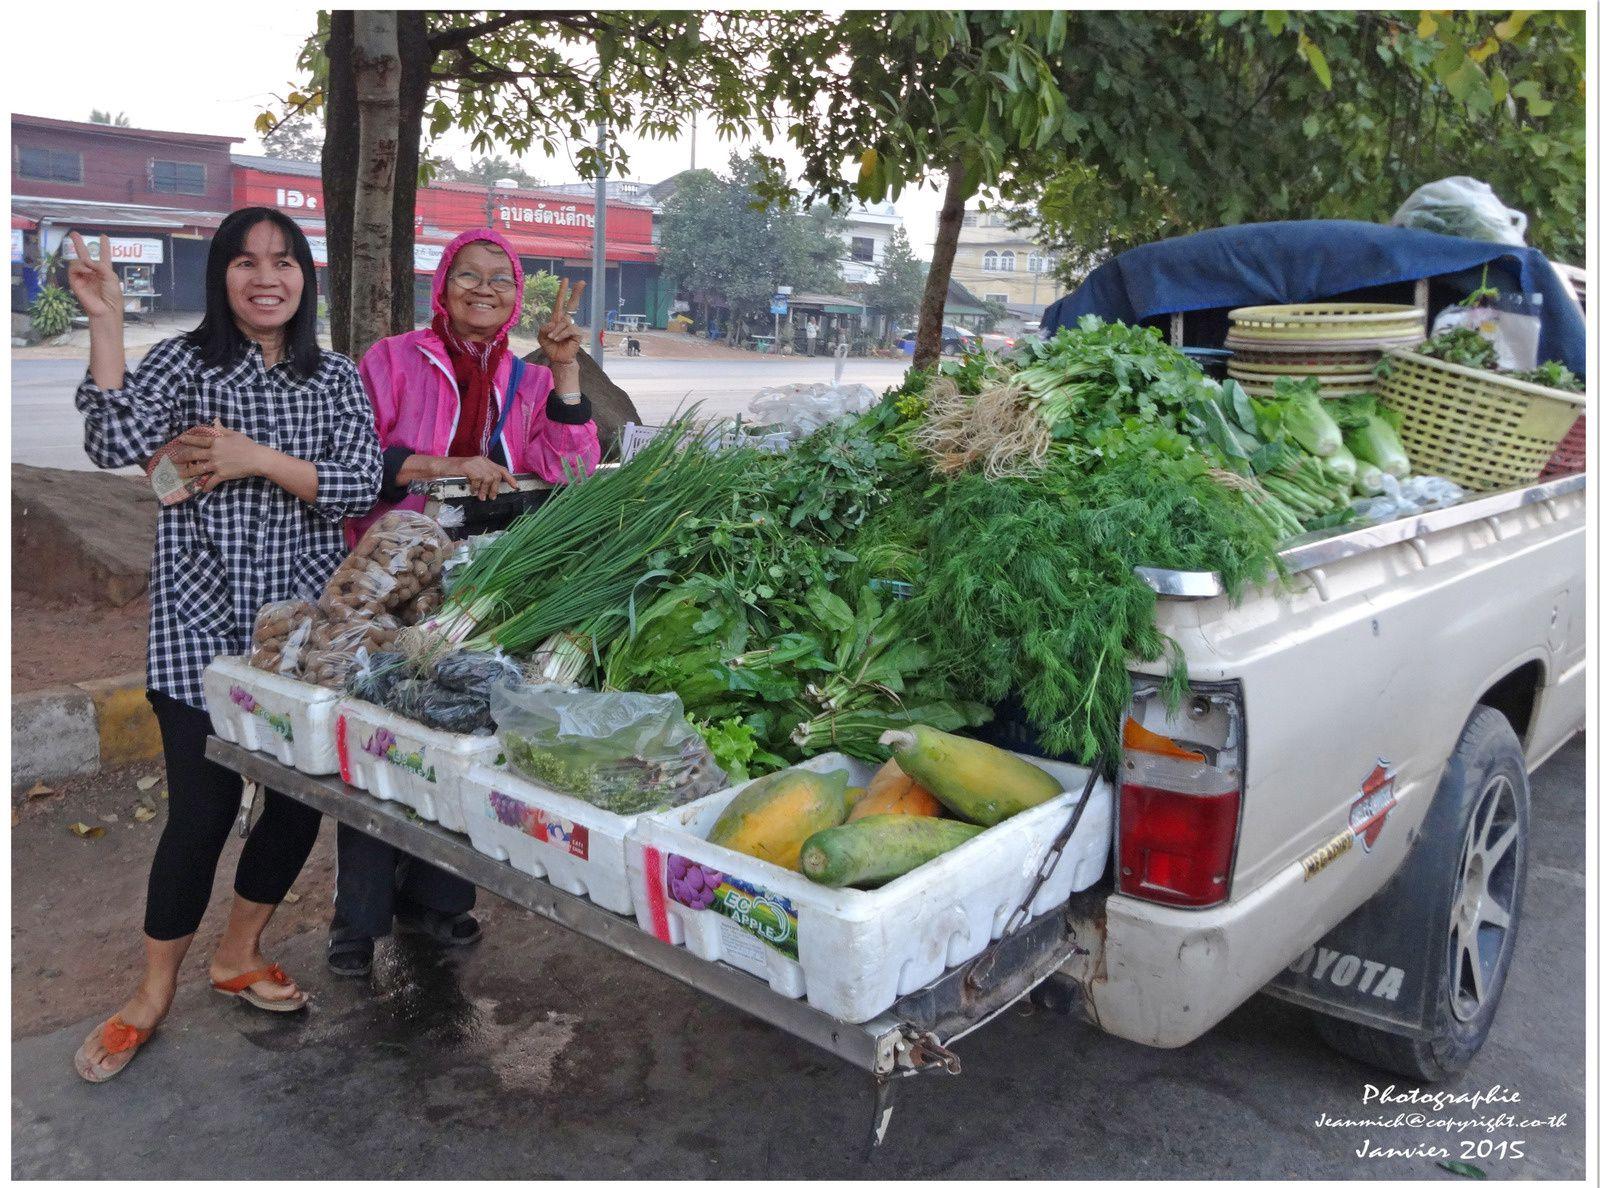 Coût de la vie en Thaïlande, les légumes.....,